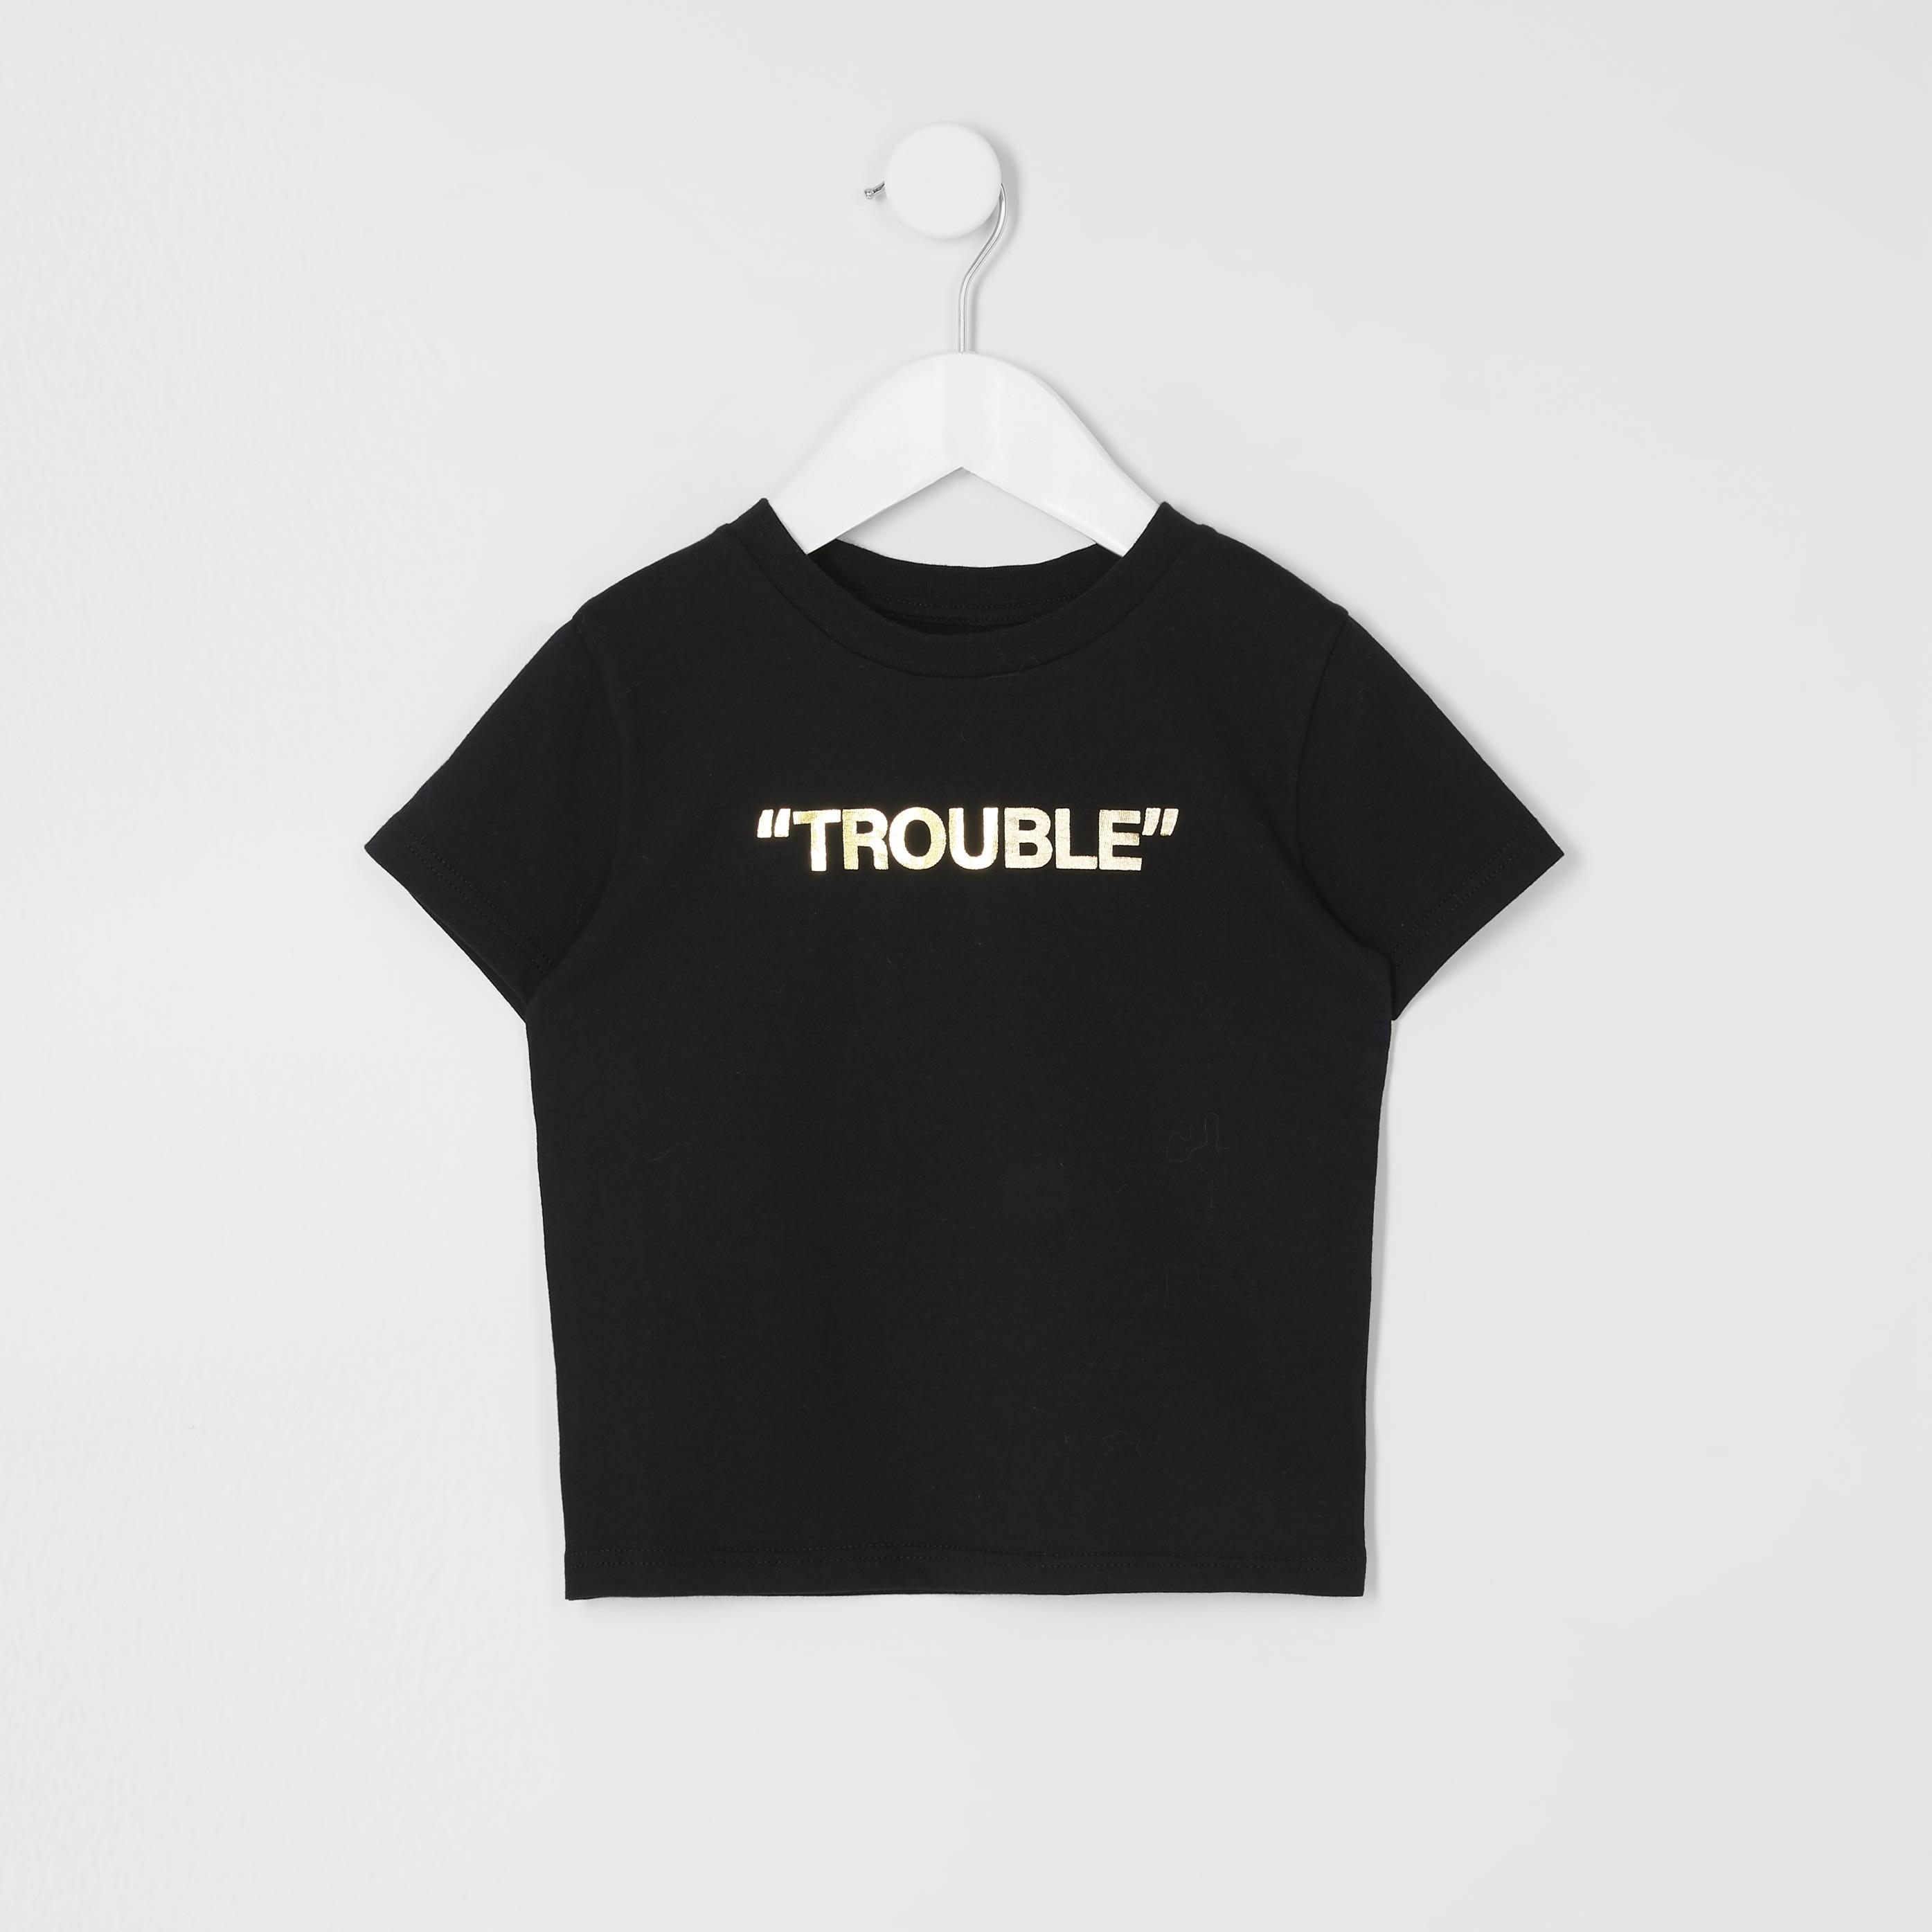 River Island Mens Baby Boys Black 'Mini boss' printed T-shirt (9-12 Mths)